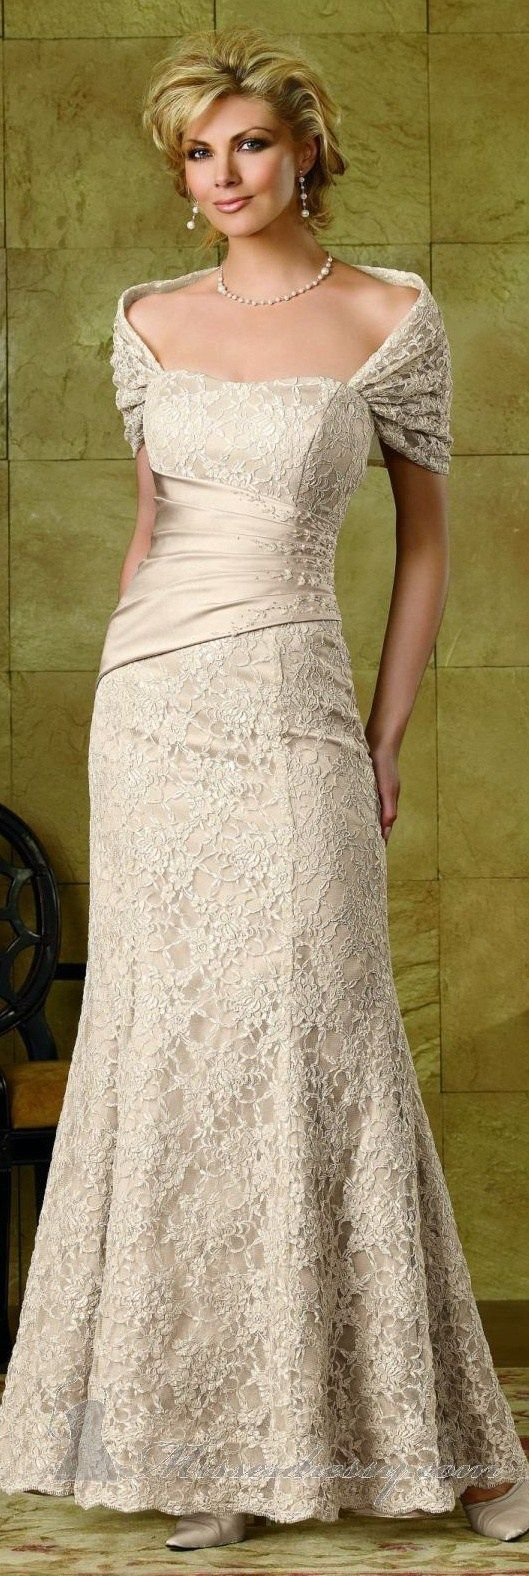 Wedding dresses for older ladies   Gorgeous Wedding Dresses for Older Brides  Wedding  Pinterest